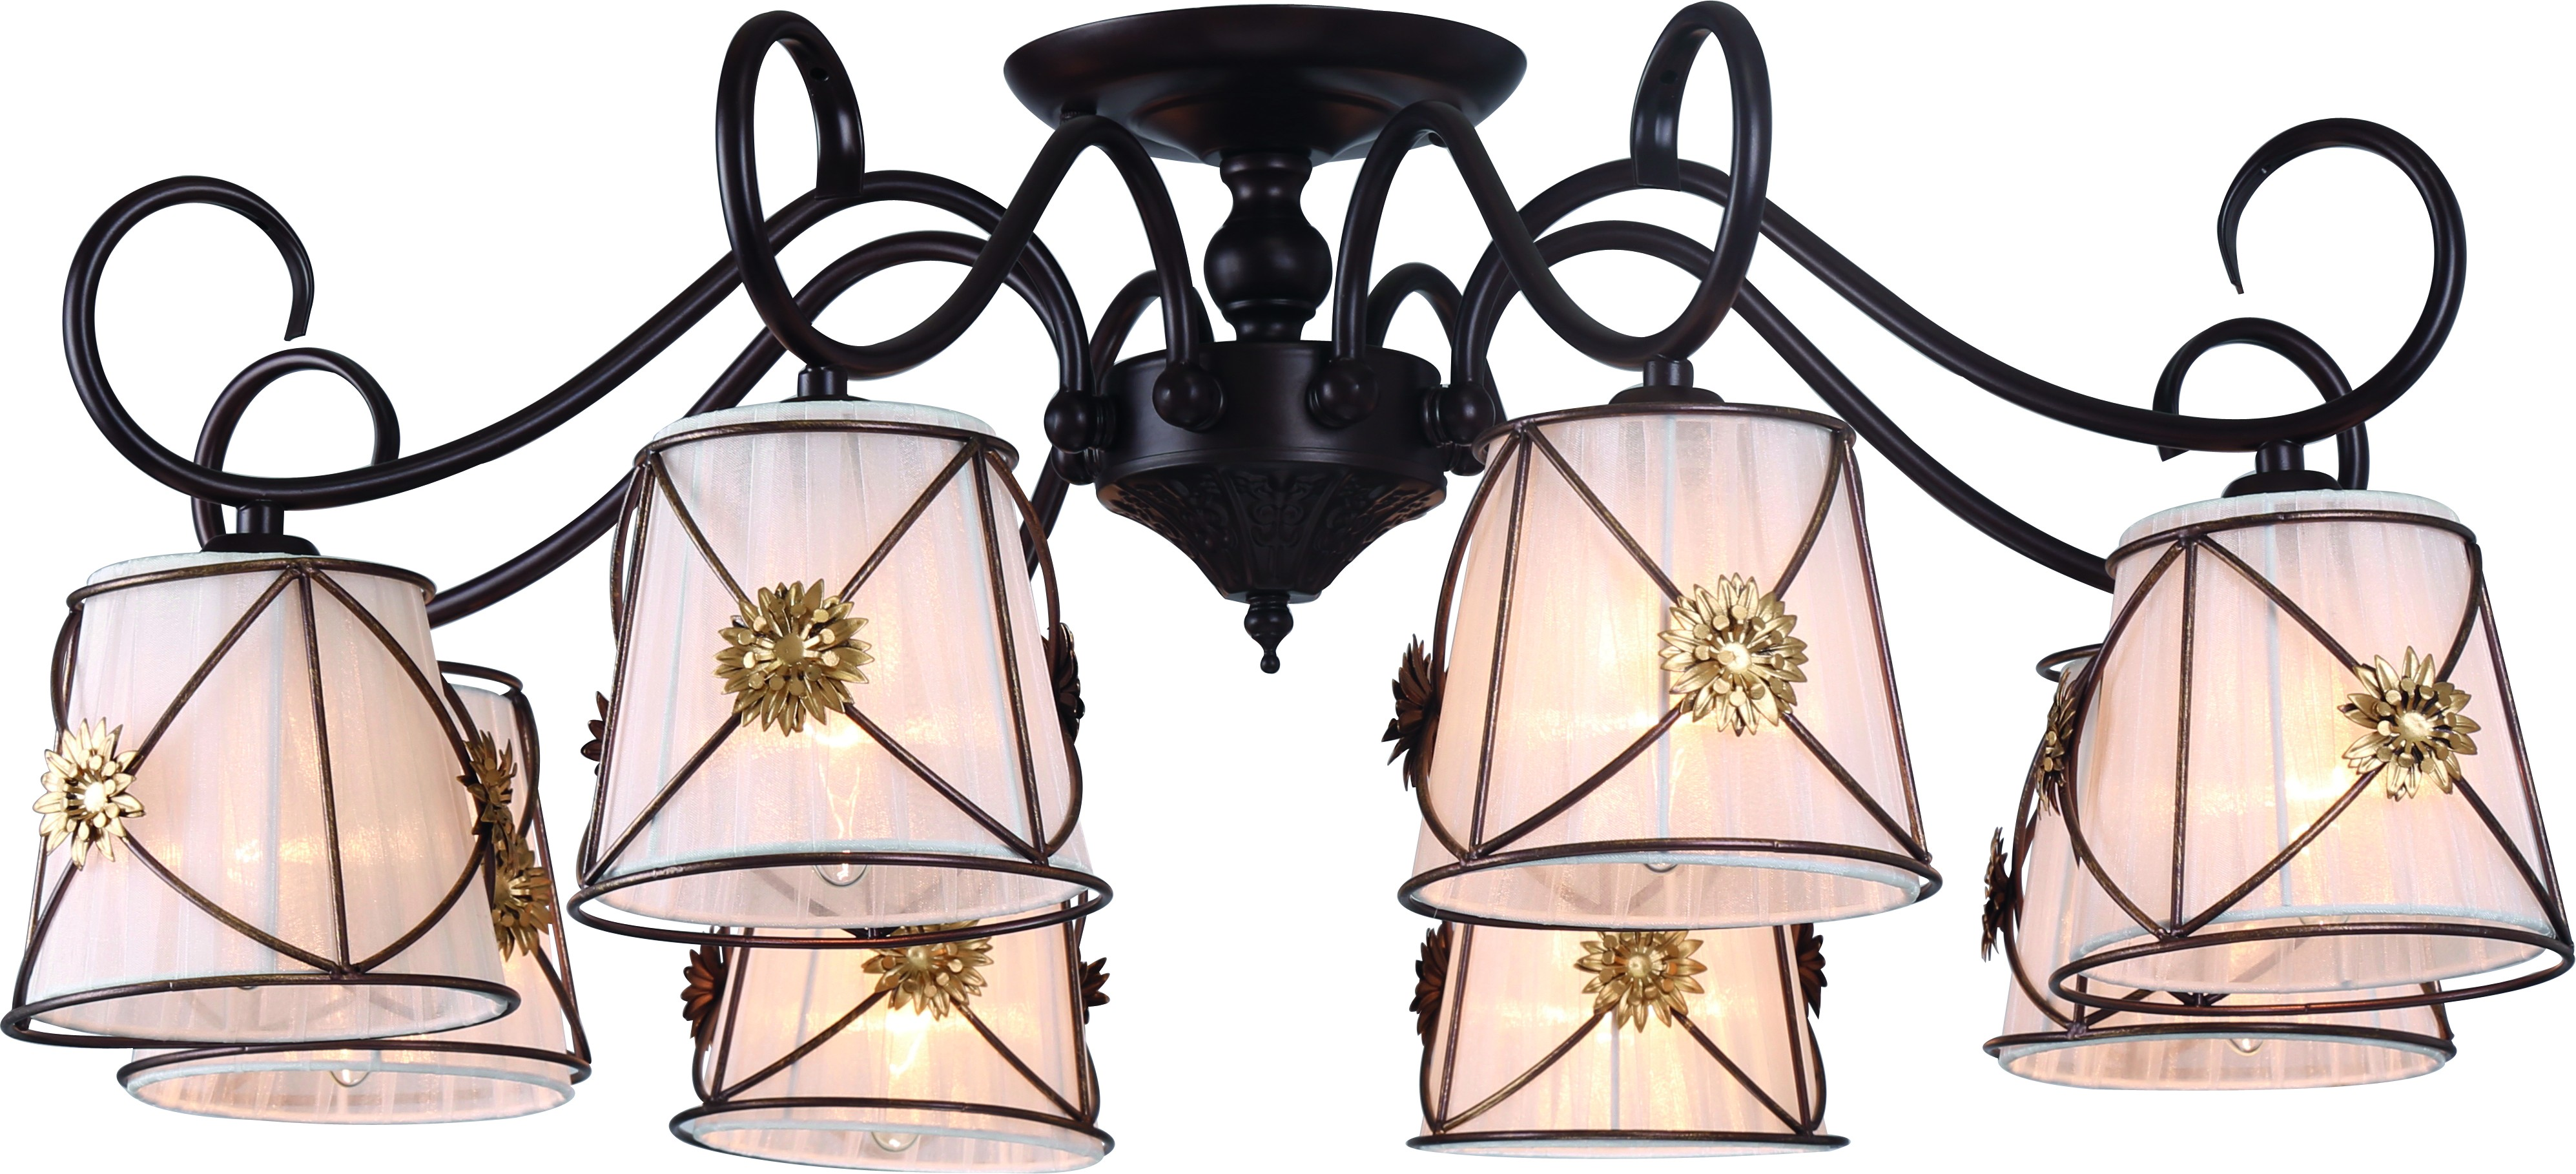 Люстра Arte lamp A5495pl-8br потолочная люстра arte lamp 72 a5495pl 5br